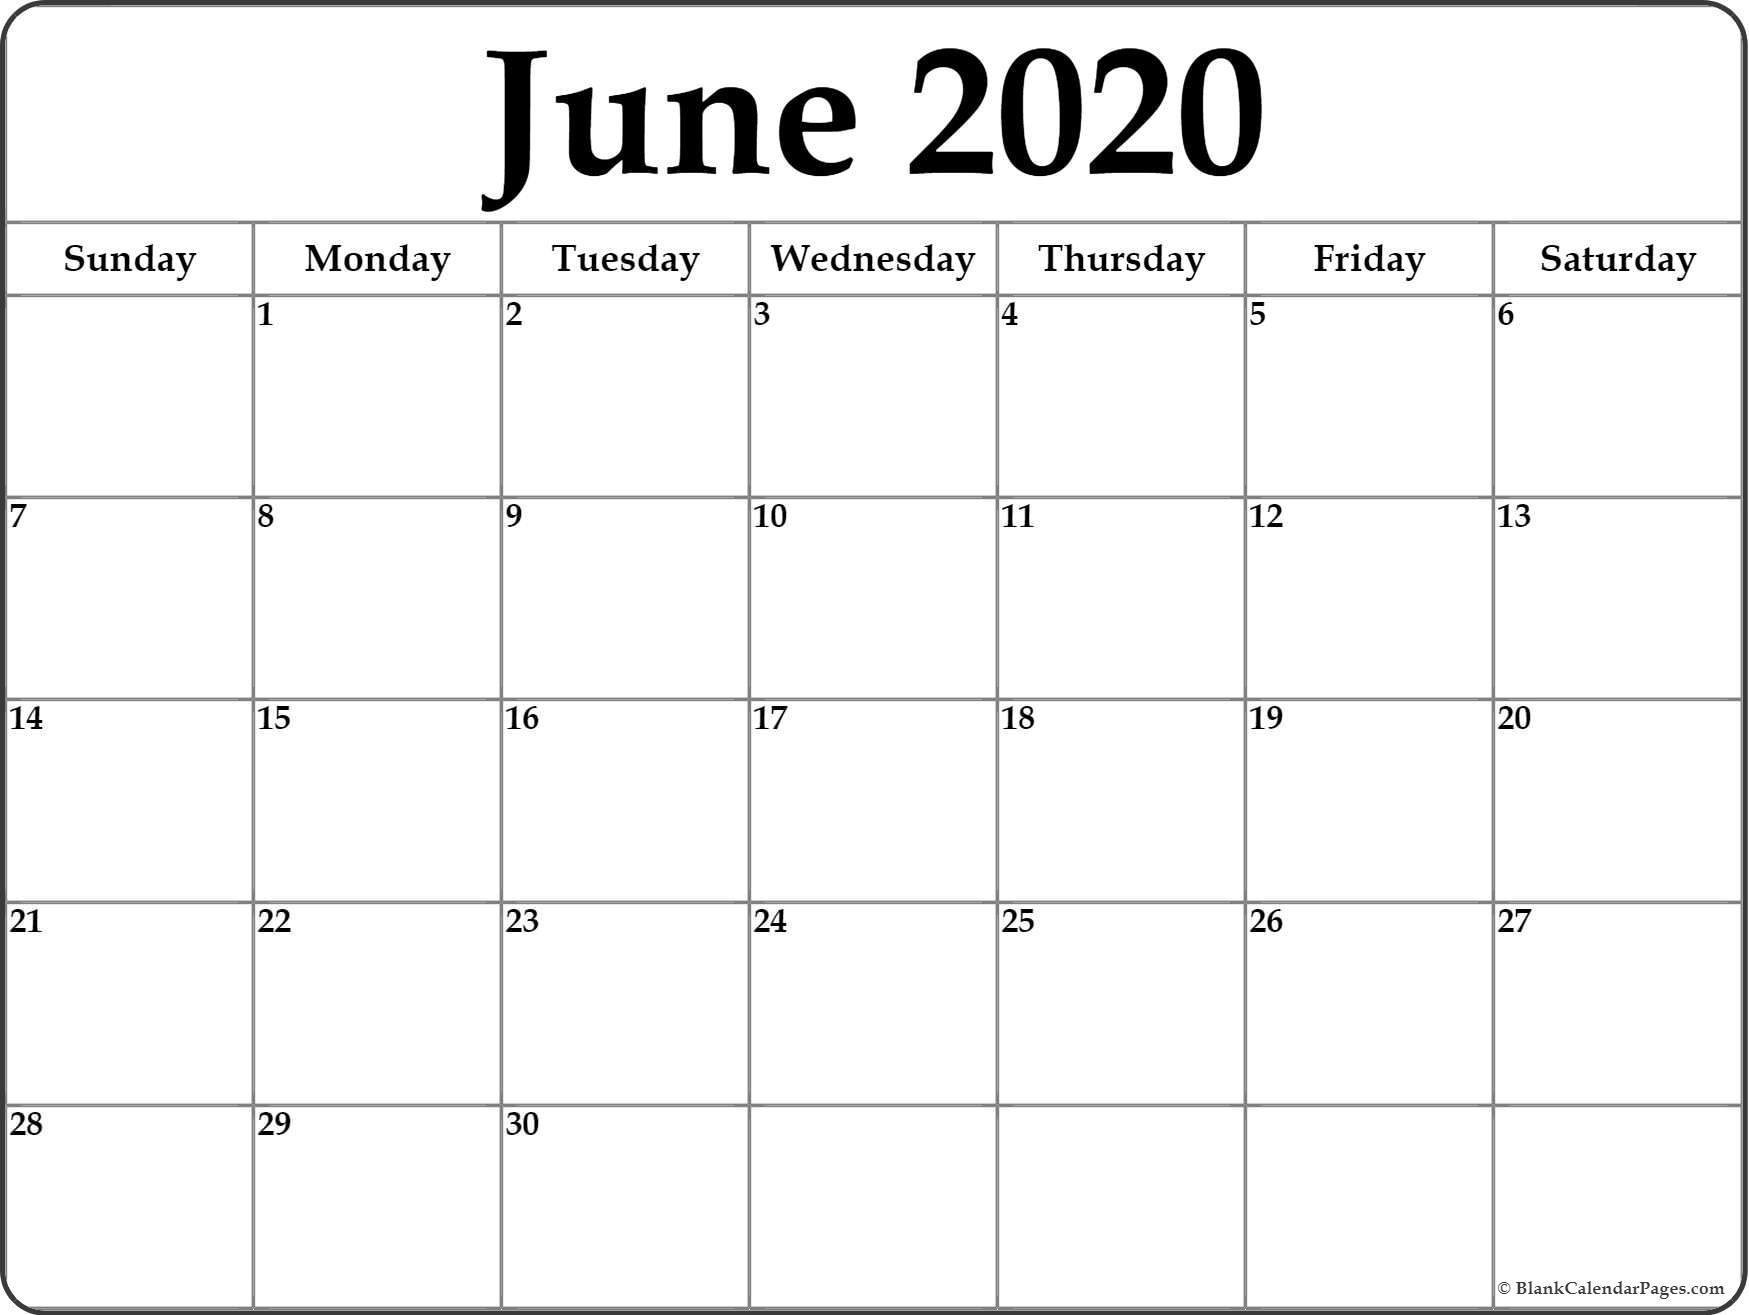 June 2020 Calendar | Free Printable Monthly Calendars-Monthly June 2020 Calendar